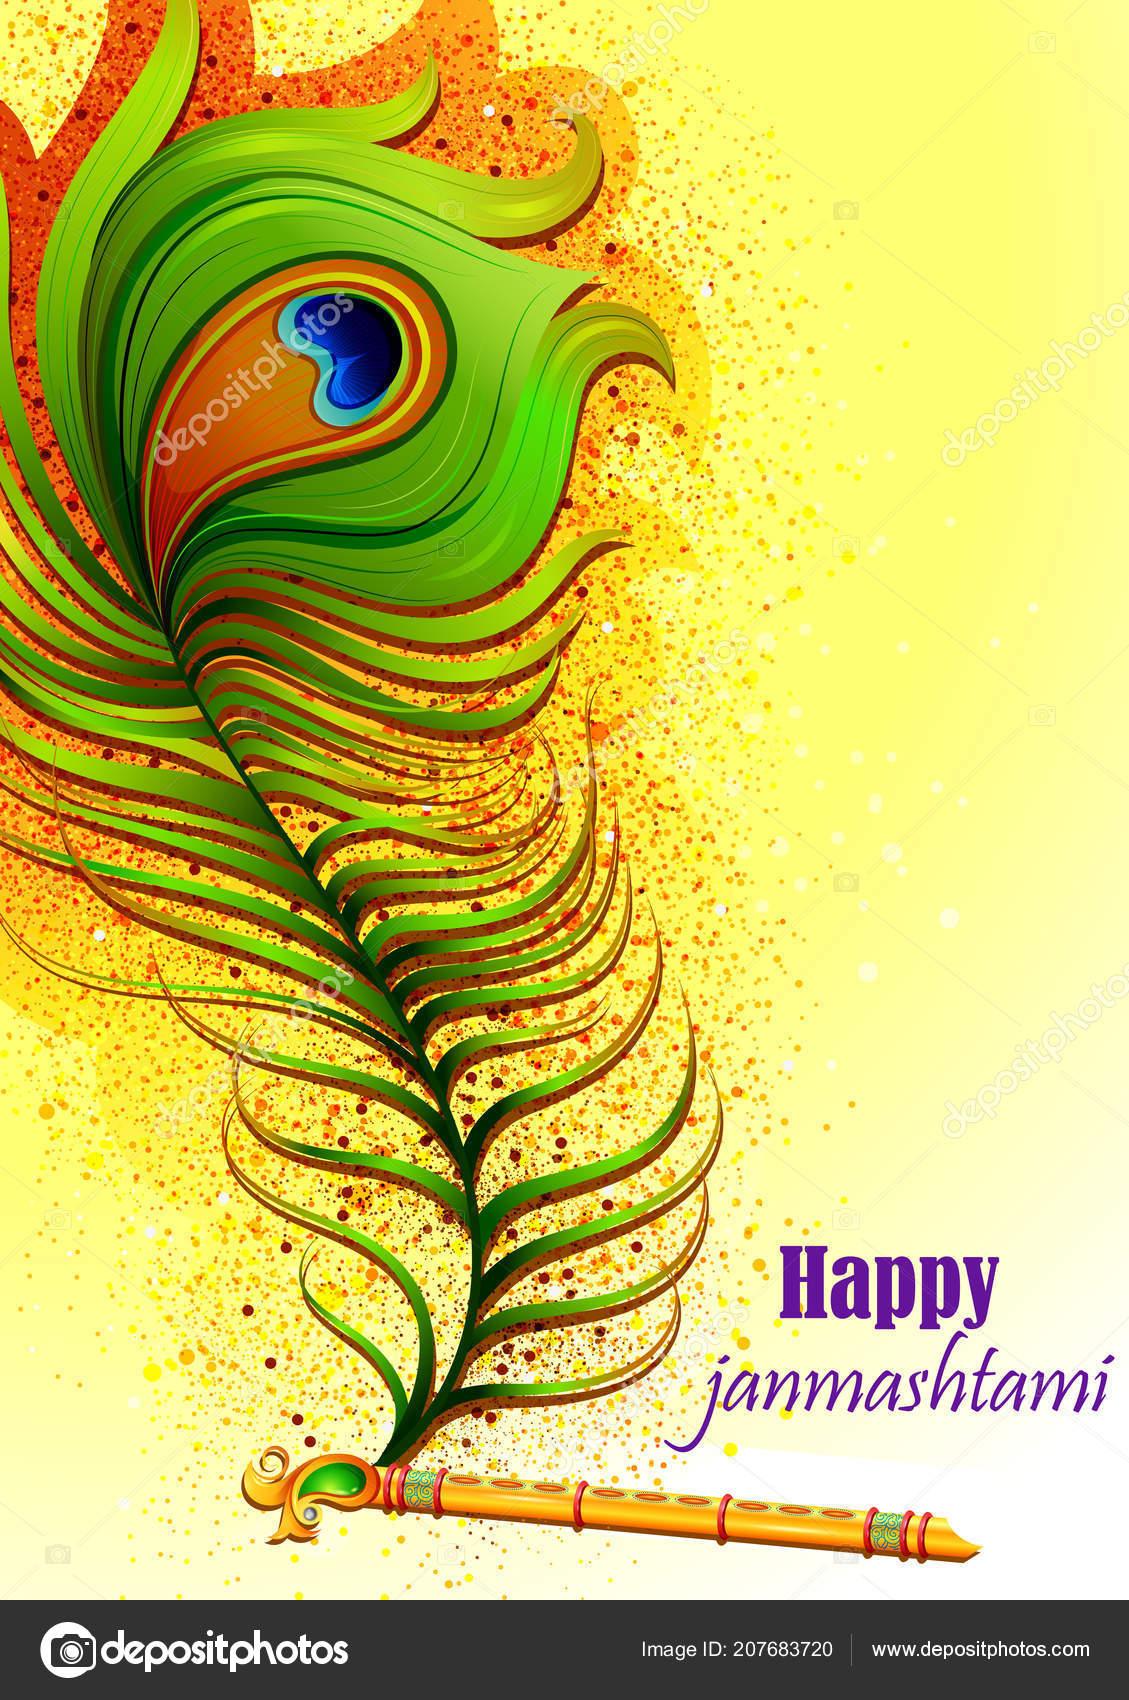 Vector Krishna Flute Krishna Flute On Happy Janmashtami India Background Stock Vector C Stockshoppe 207683720